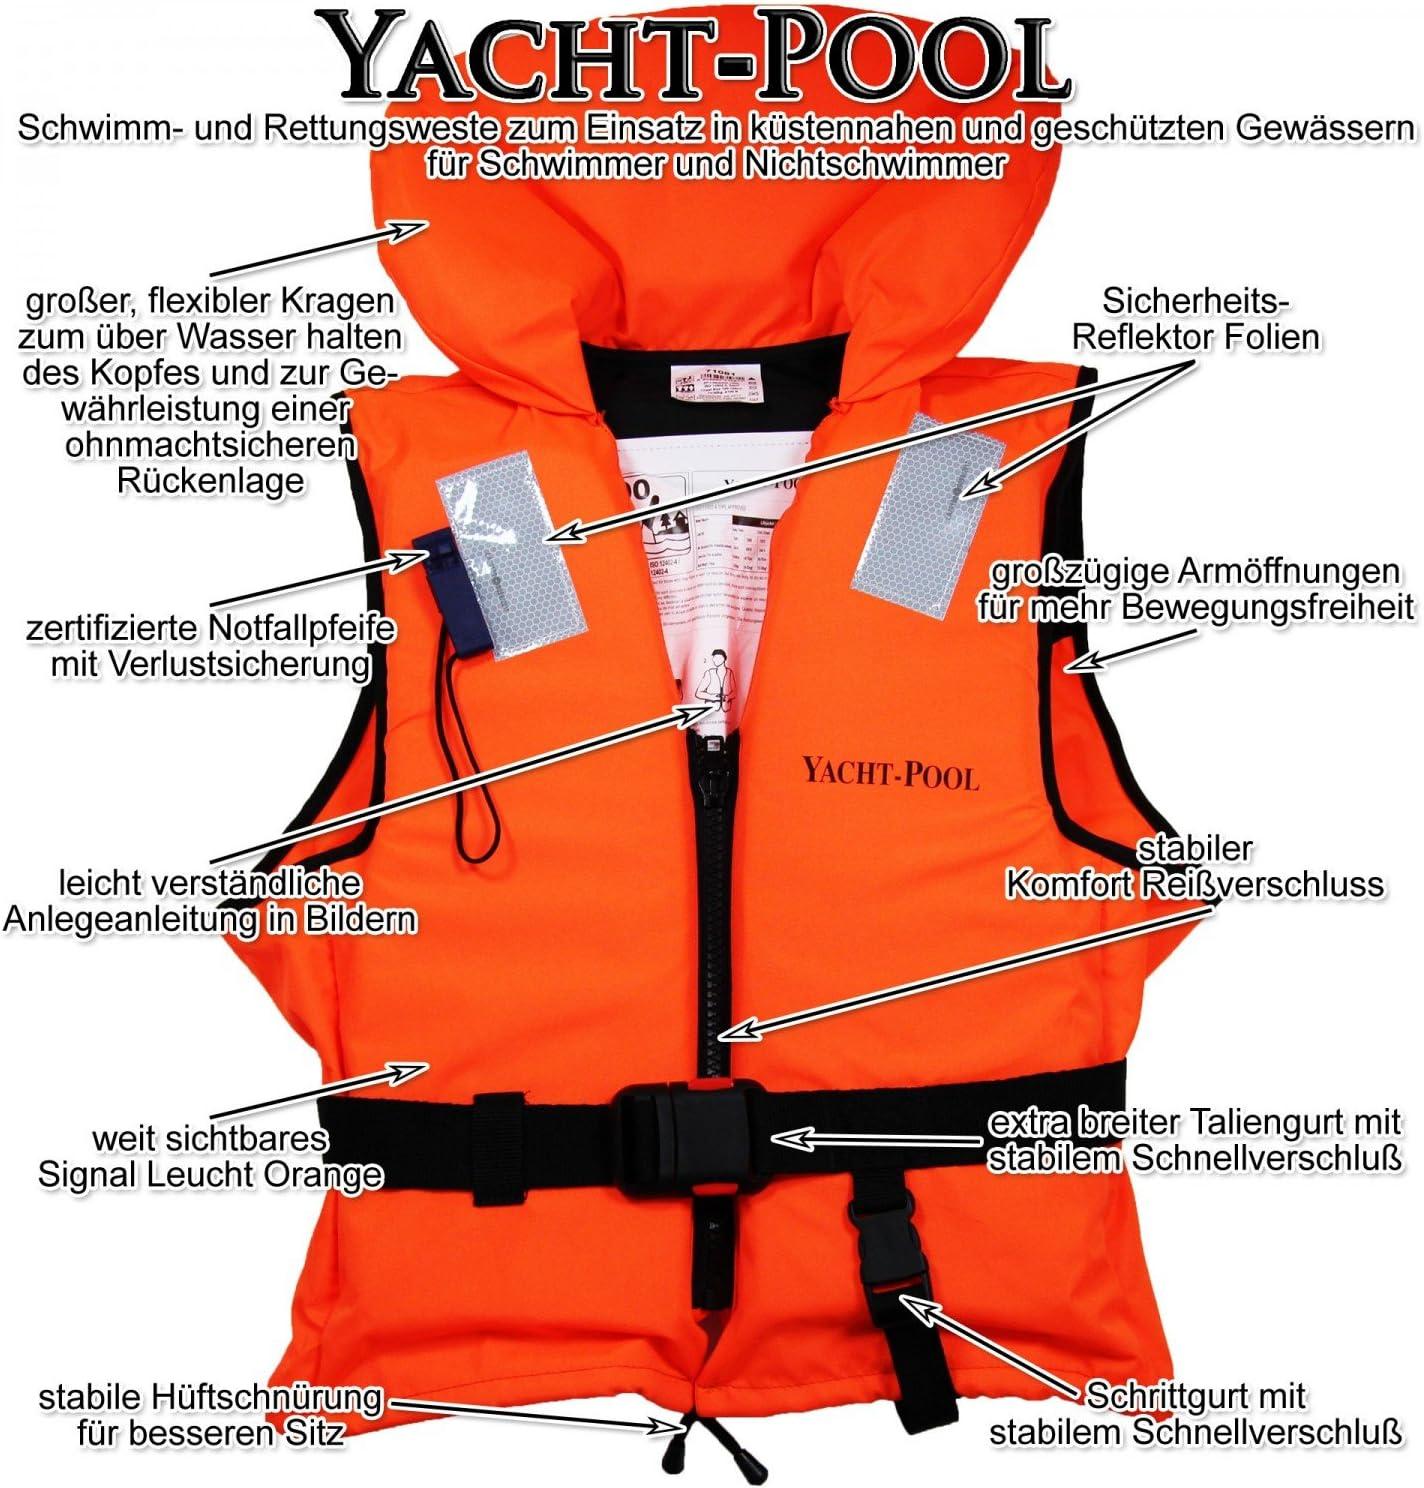 Rettungsweste 15-30kg Schwimmweste ISO 12402-4 Feststoffweste 100 Newton